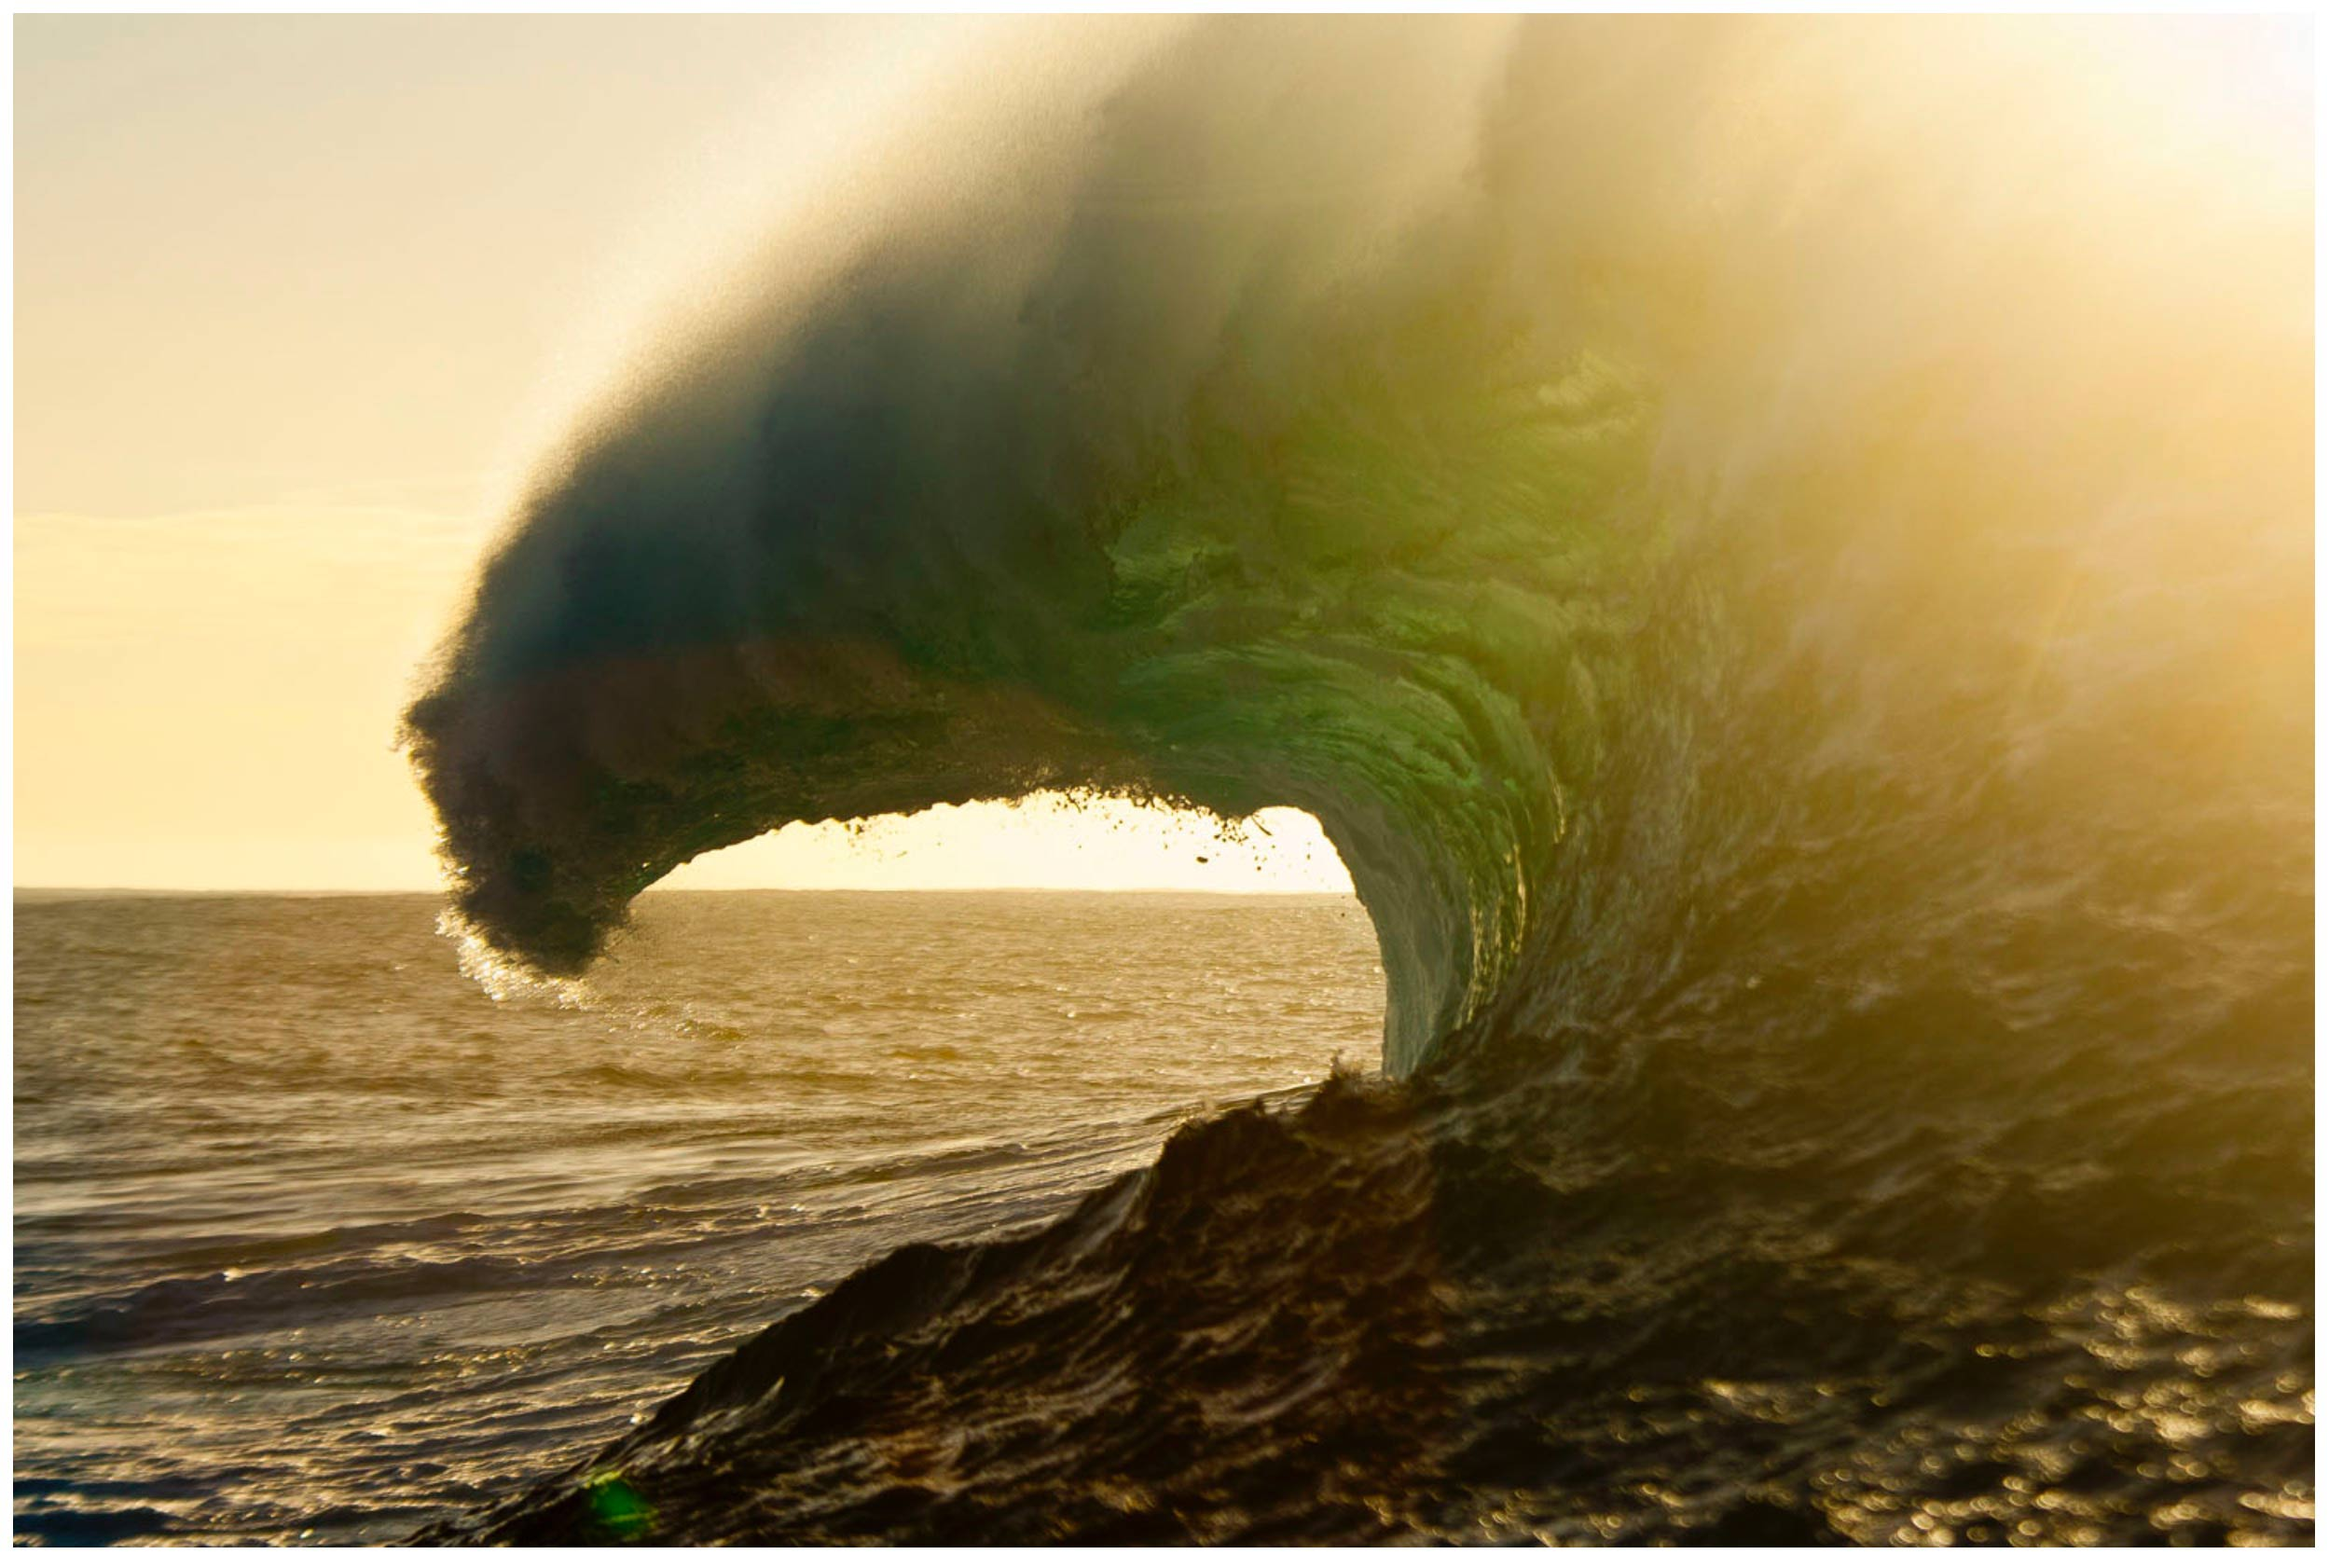 rodd-owen-ocean-surf-photography-for-sale-147.jpg